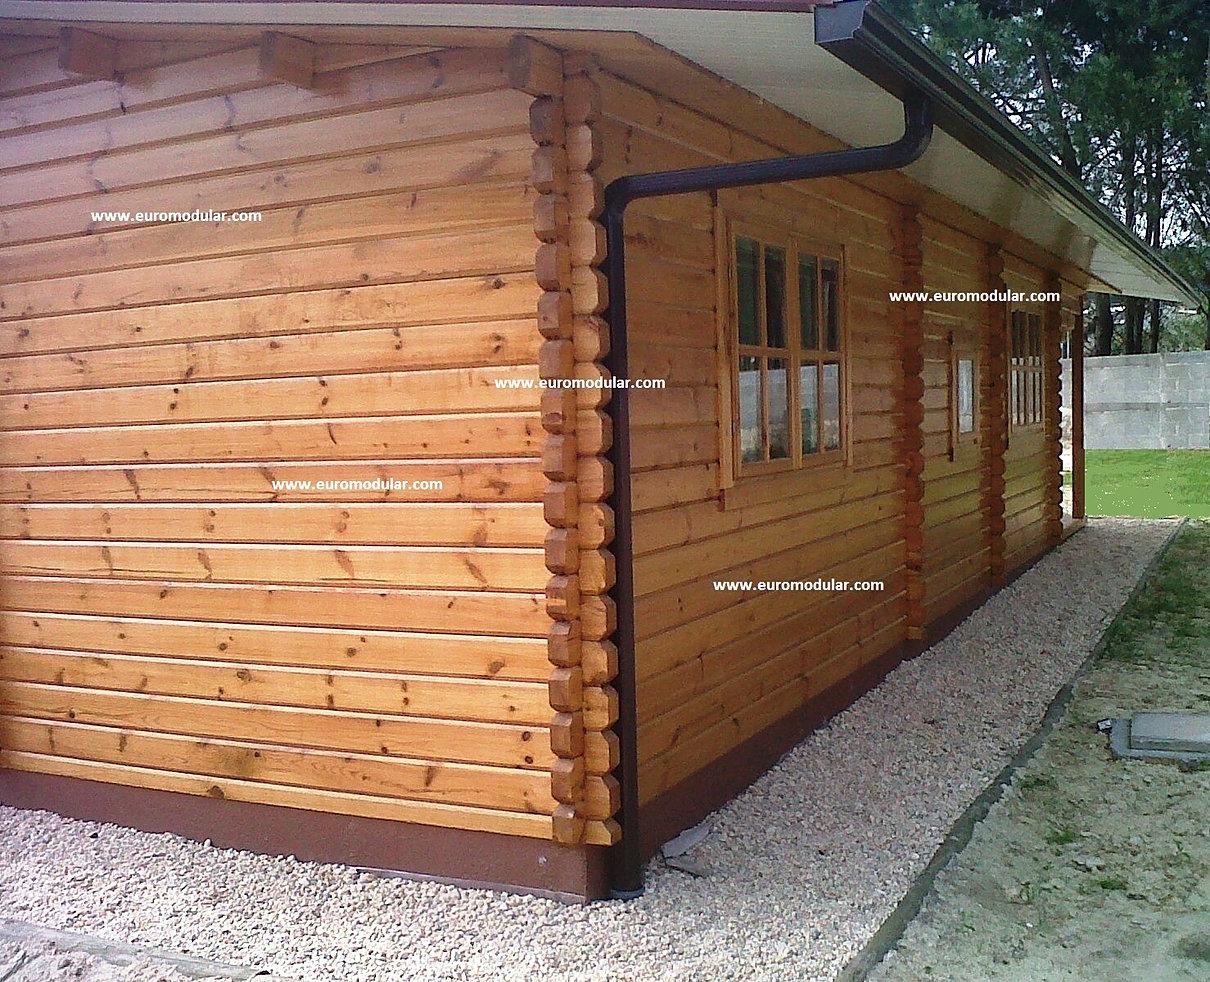 Casas de madeira euromodular bungalows prefabricados for Casetas economicas